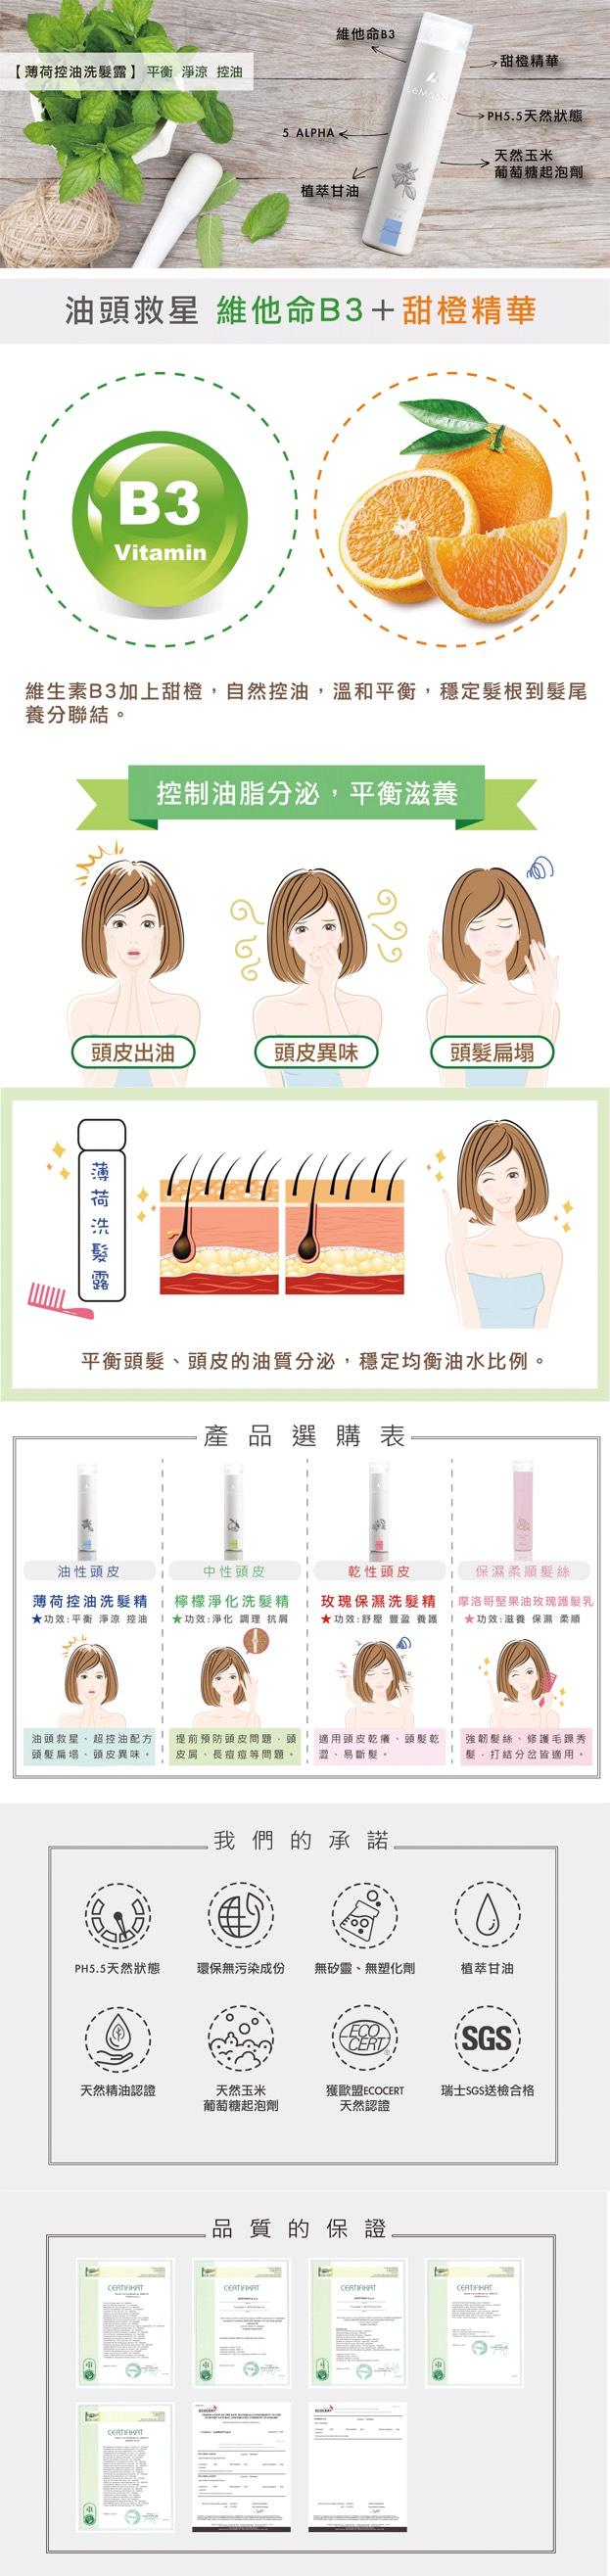 【LeMood】|精萃薄荷控油 洗髮露 (控油淨涼系列 ) - 300 ml